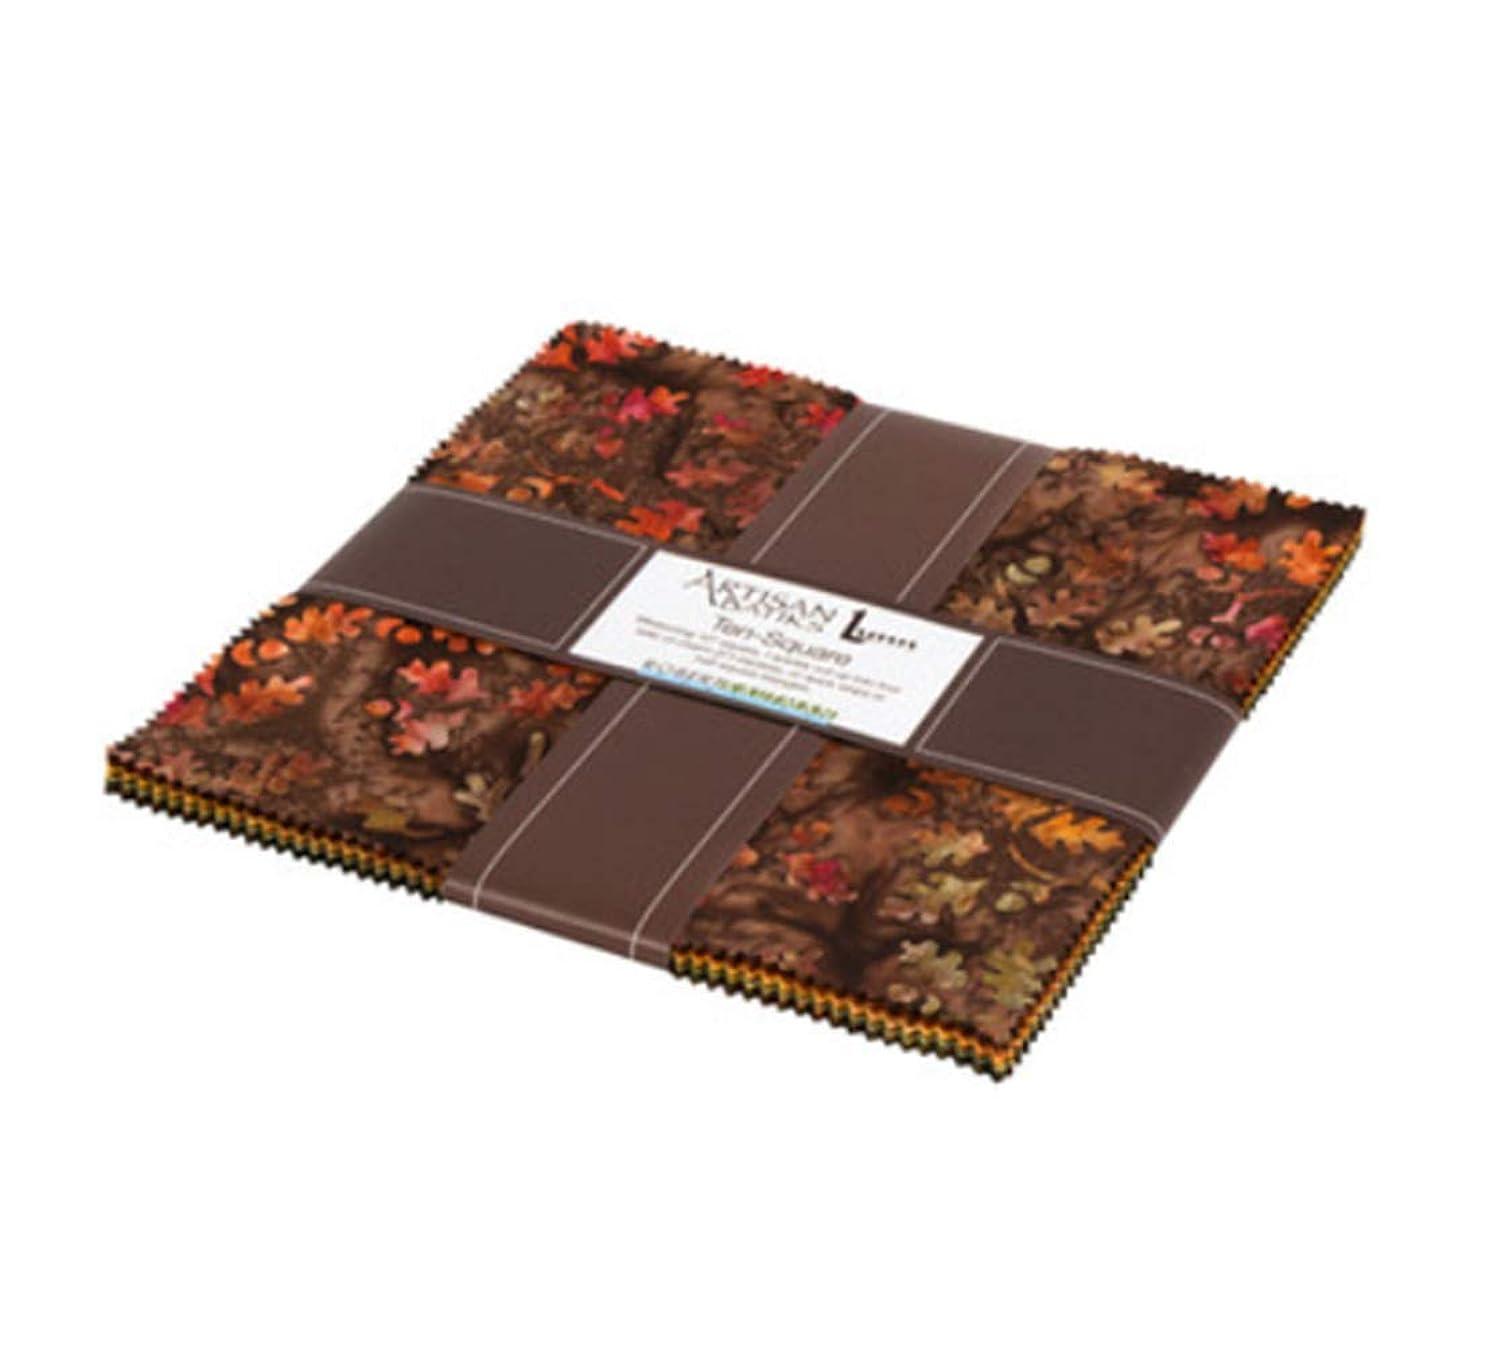 Artisan Batiks Cornucopia 10 Ten Square 42 10-inch Squares Layer Cake Robert Kaufman TEN-678-42